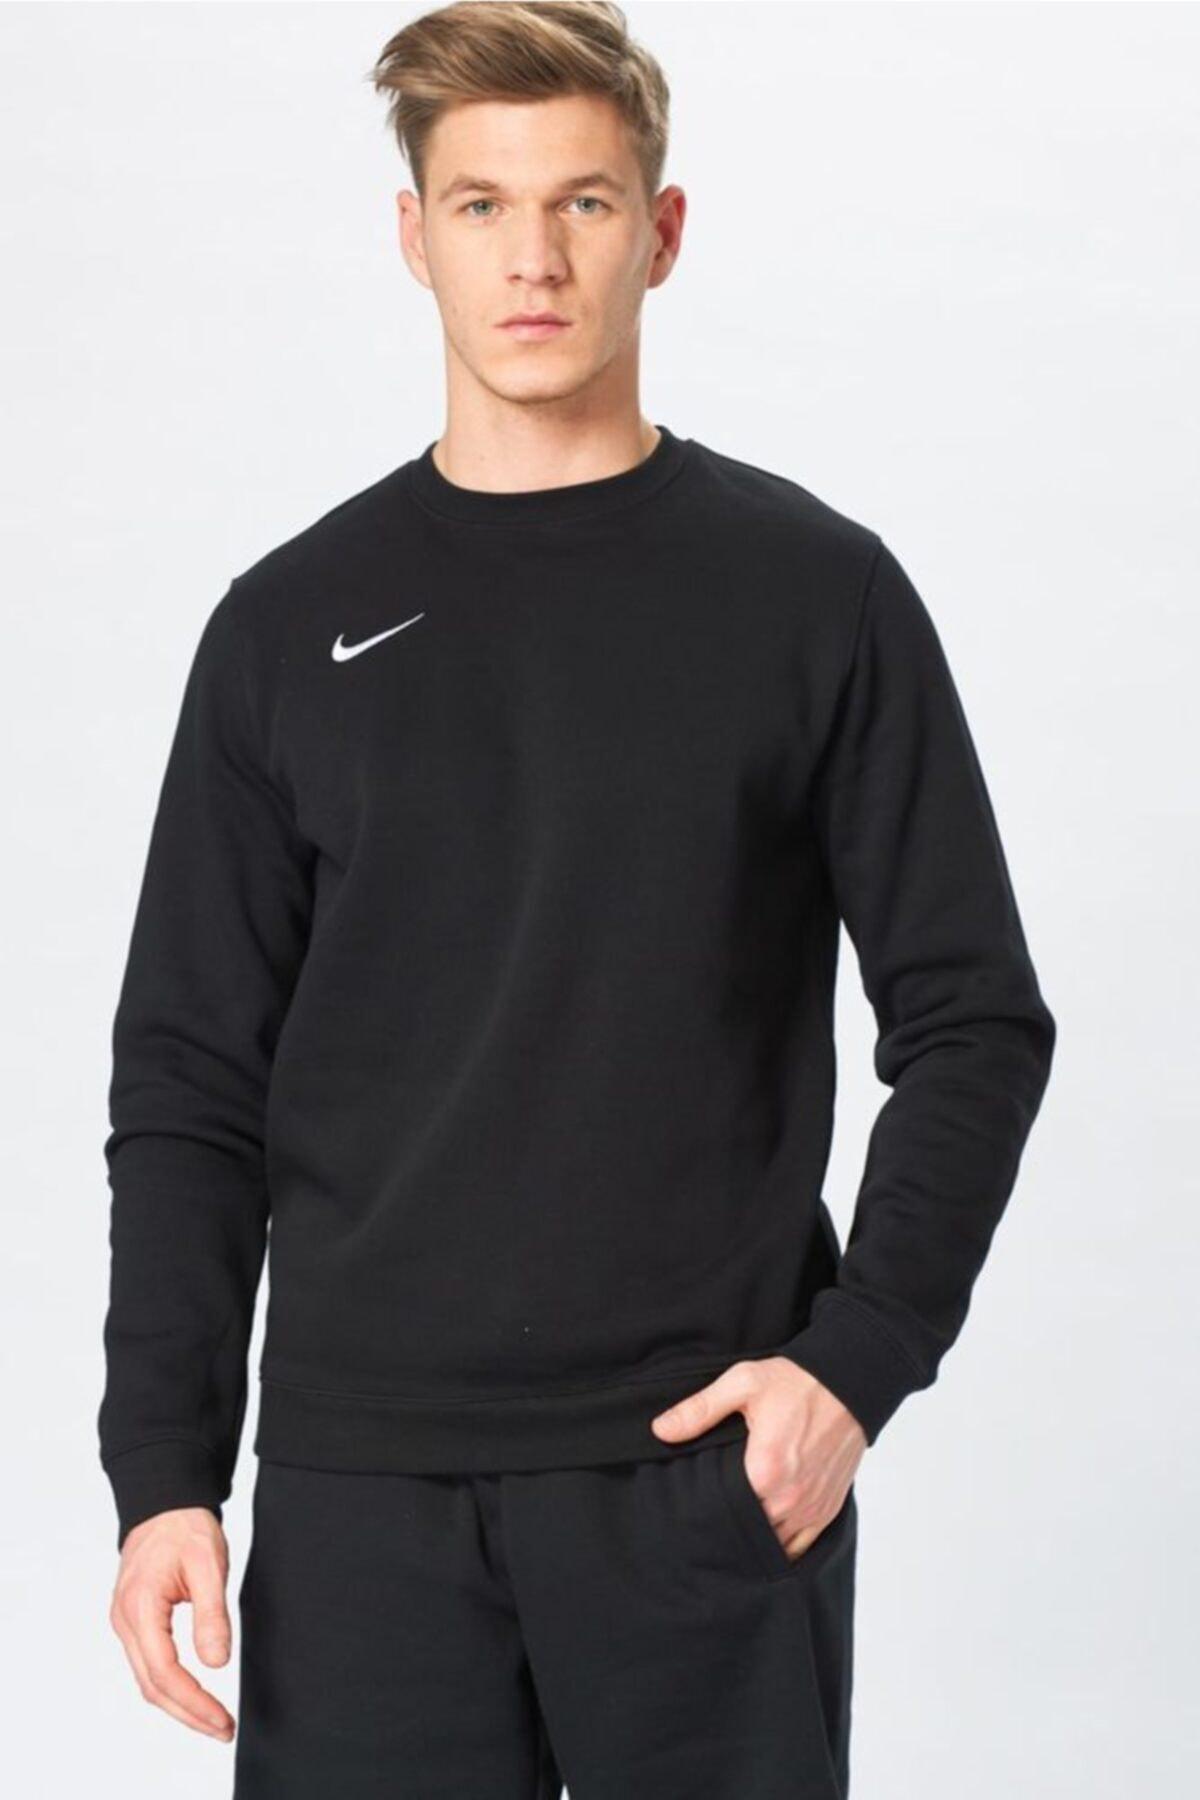 Nike Erkek Siyah Sweatshirt - M Crw Flc Tm Club19 - AJ1466-010 1